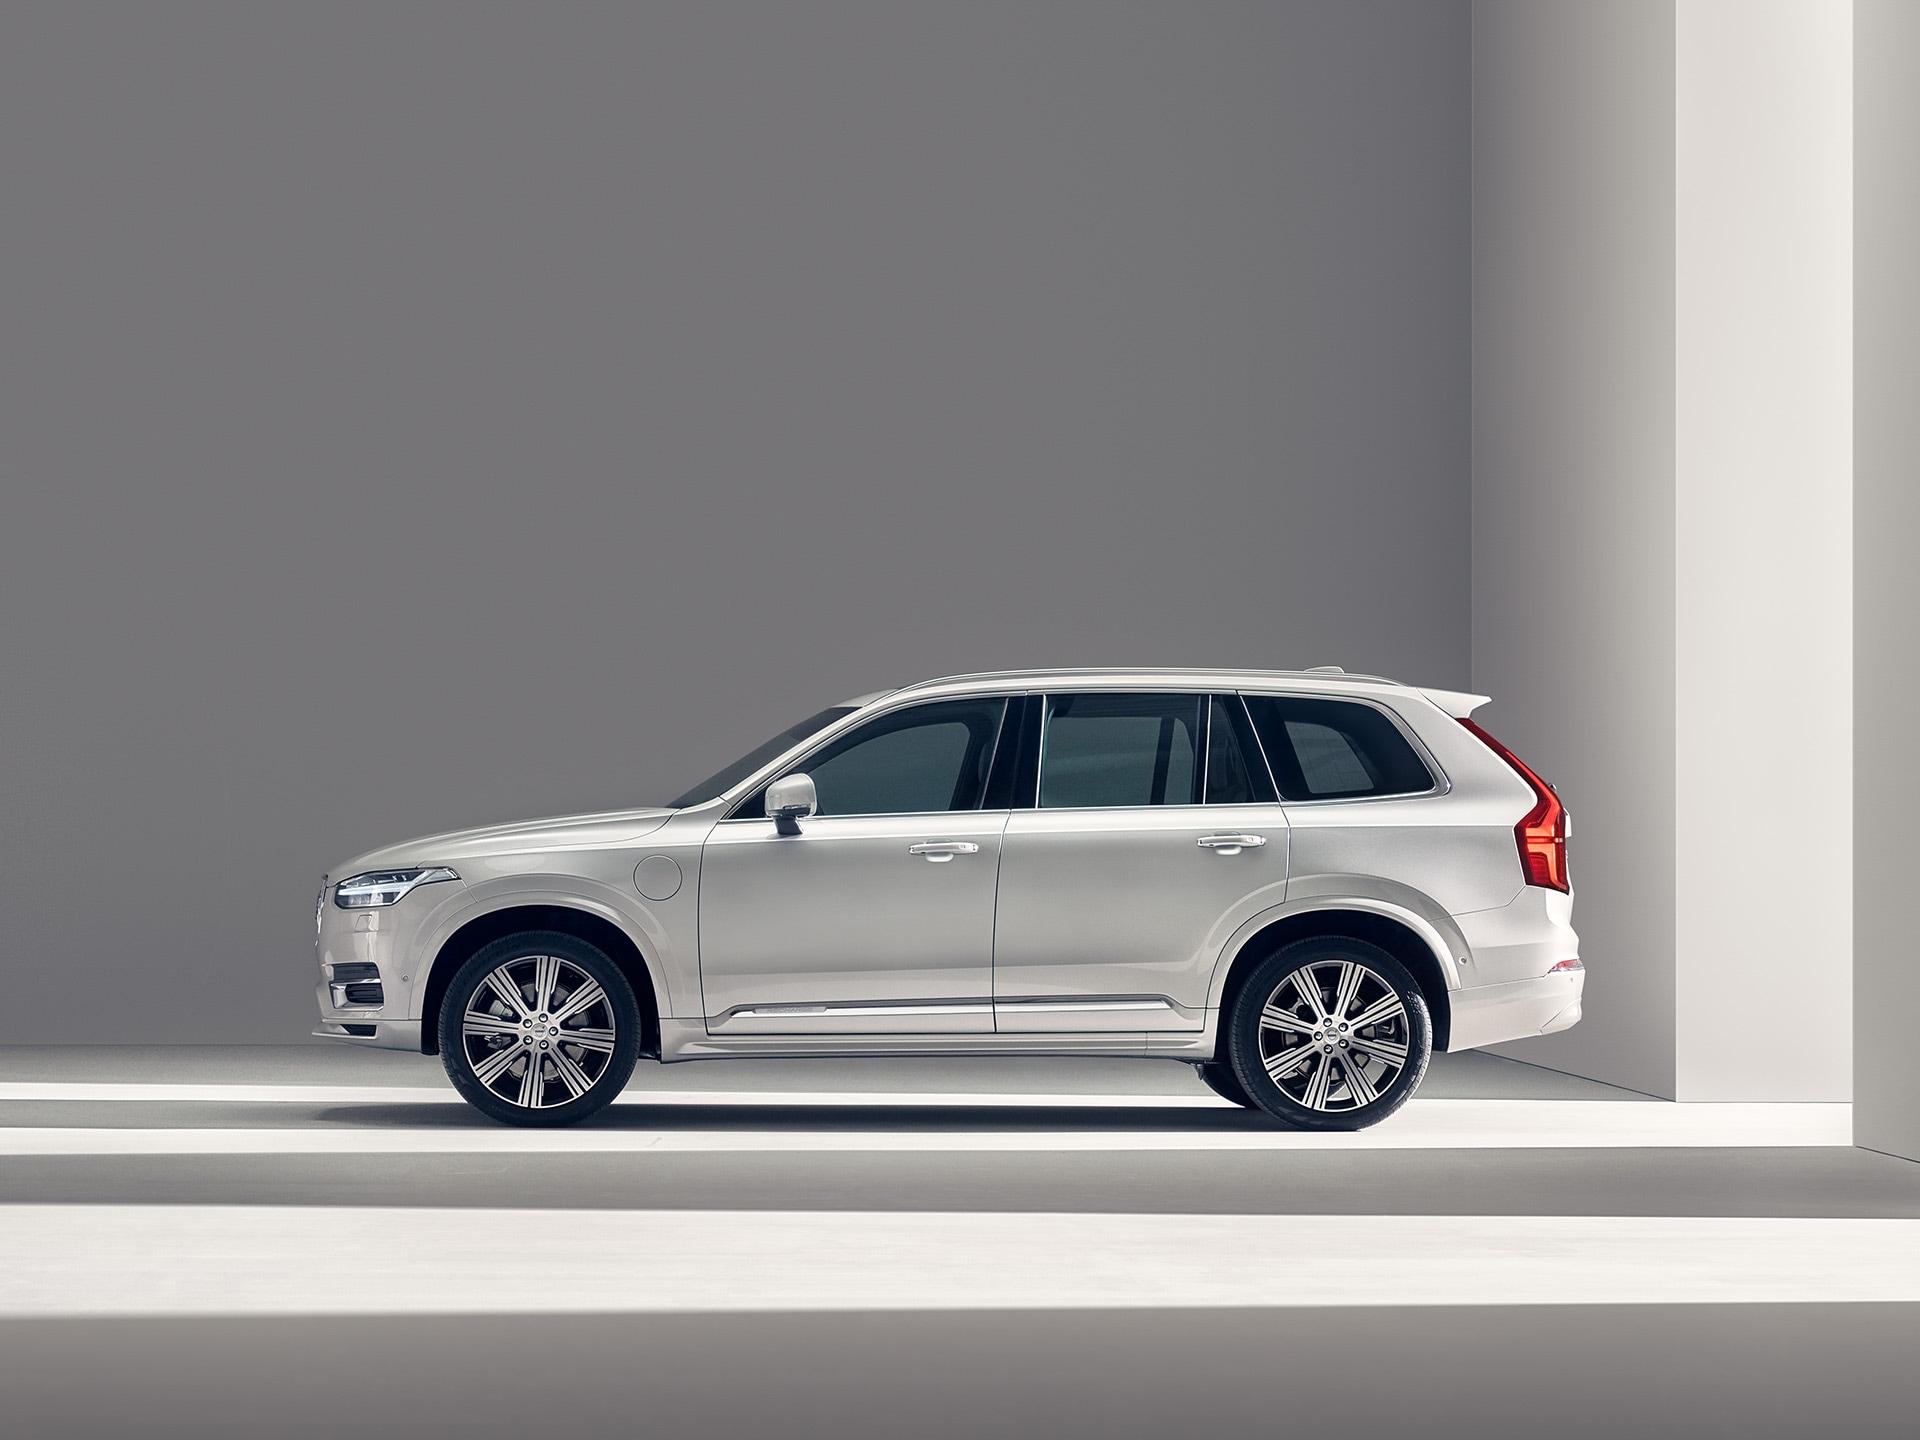 SUV Volvo XC90 Recharge blanc en charge